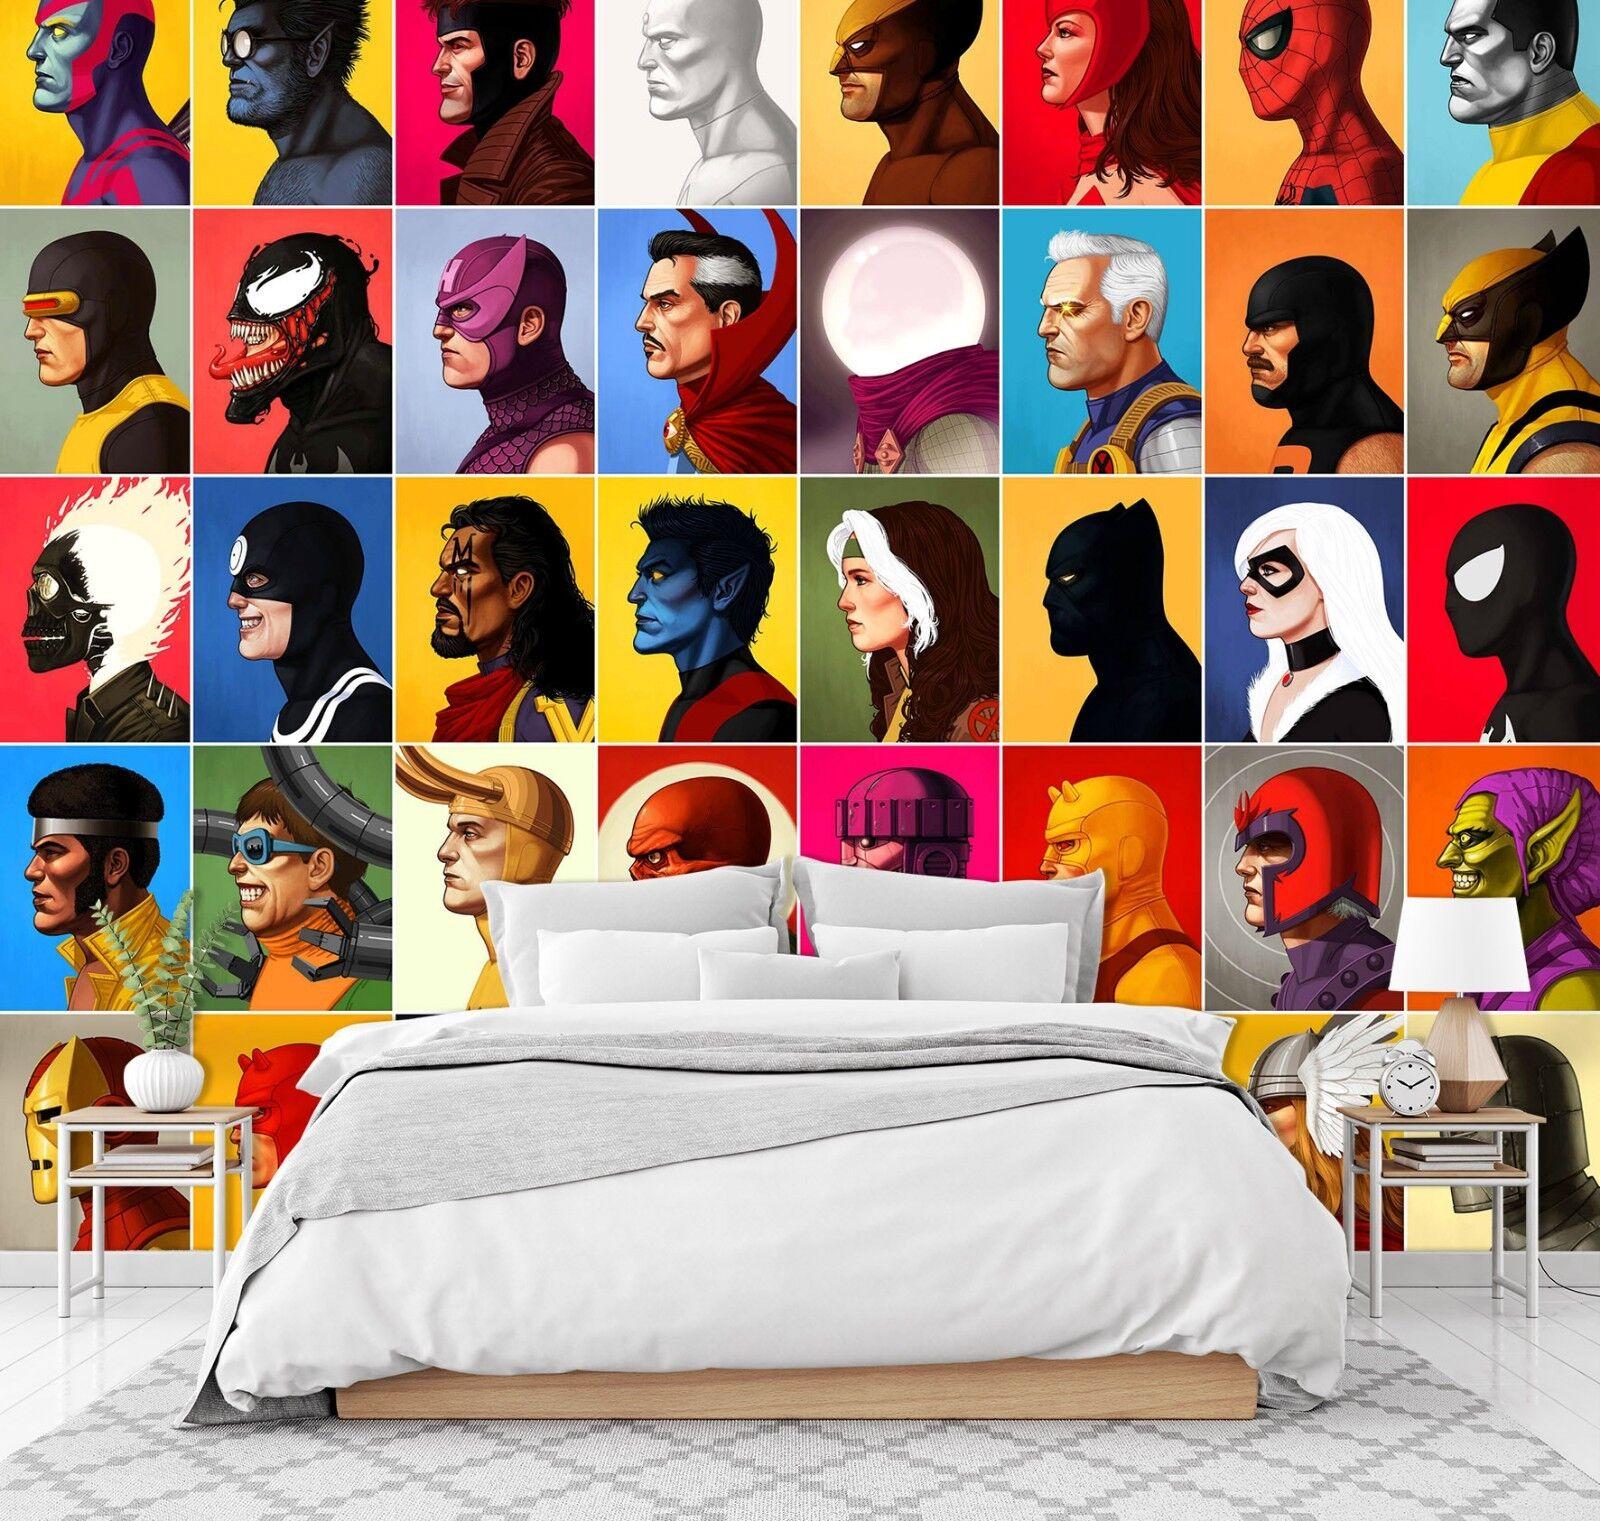 3D Face People 225 Wallpaper Mural Wallpaper UK Jenny